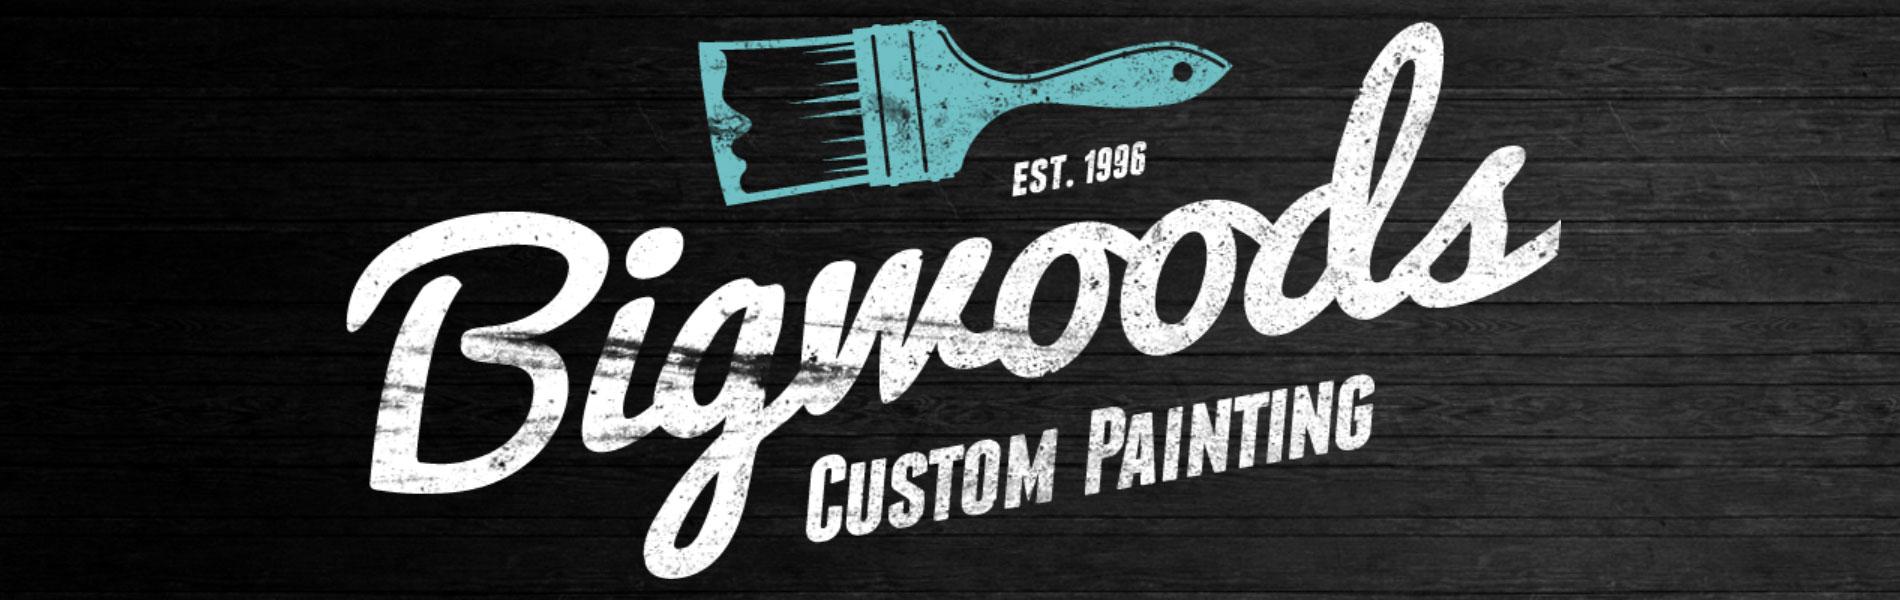 Bigwood's Custom Painting